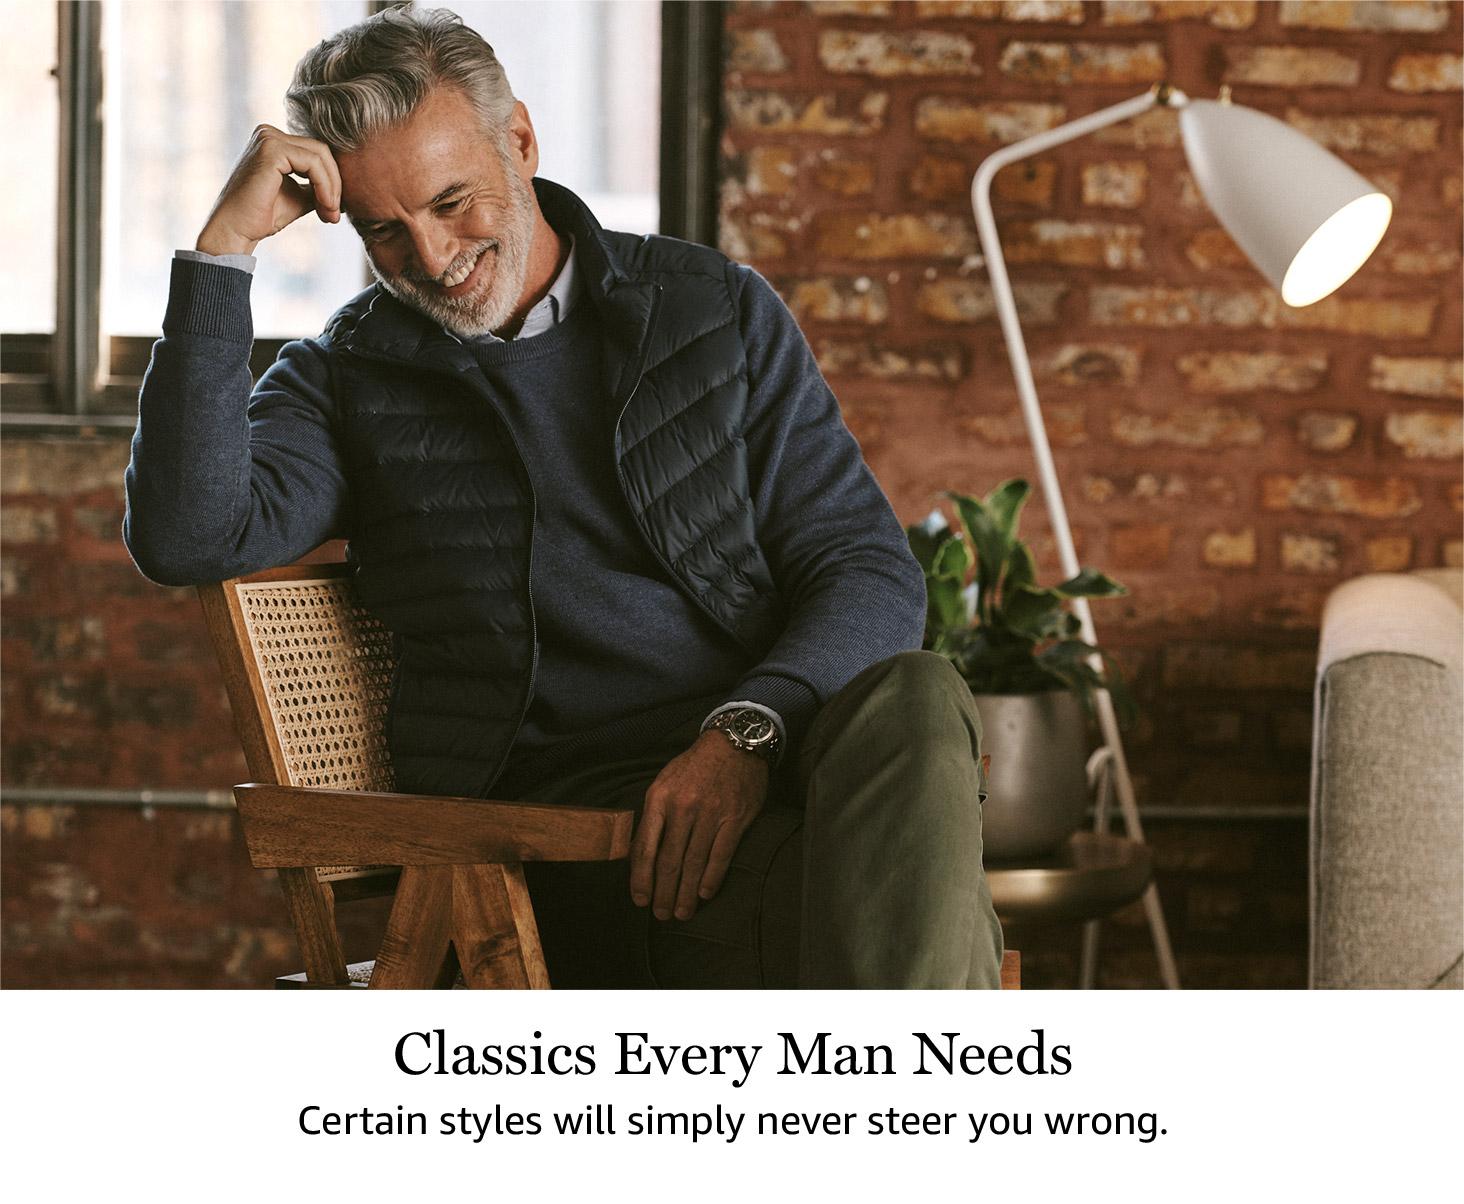 Classics every man needs